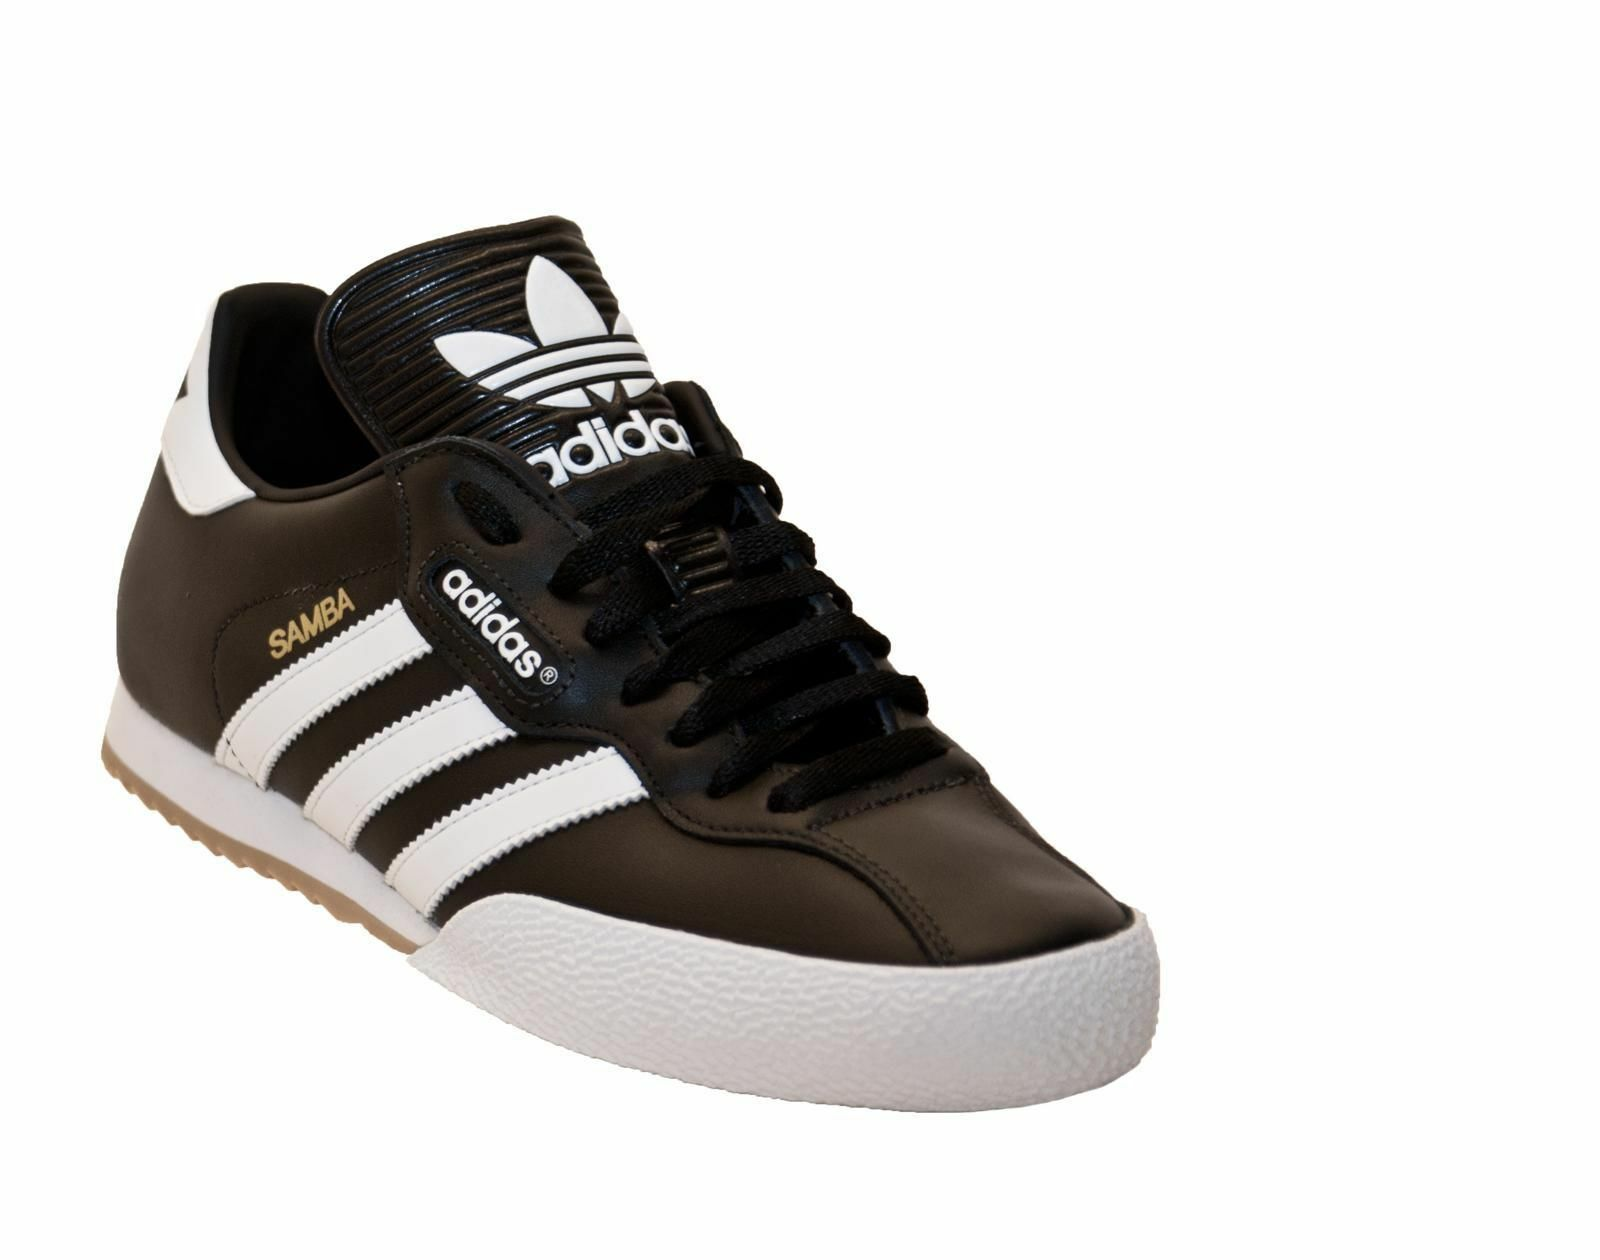 NUOVO Adidas Originale Uomo Samba Super Scarpe Da taglia Ginnastica Nero / Bianco taglia Da 7-11 9fb570